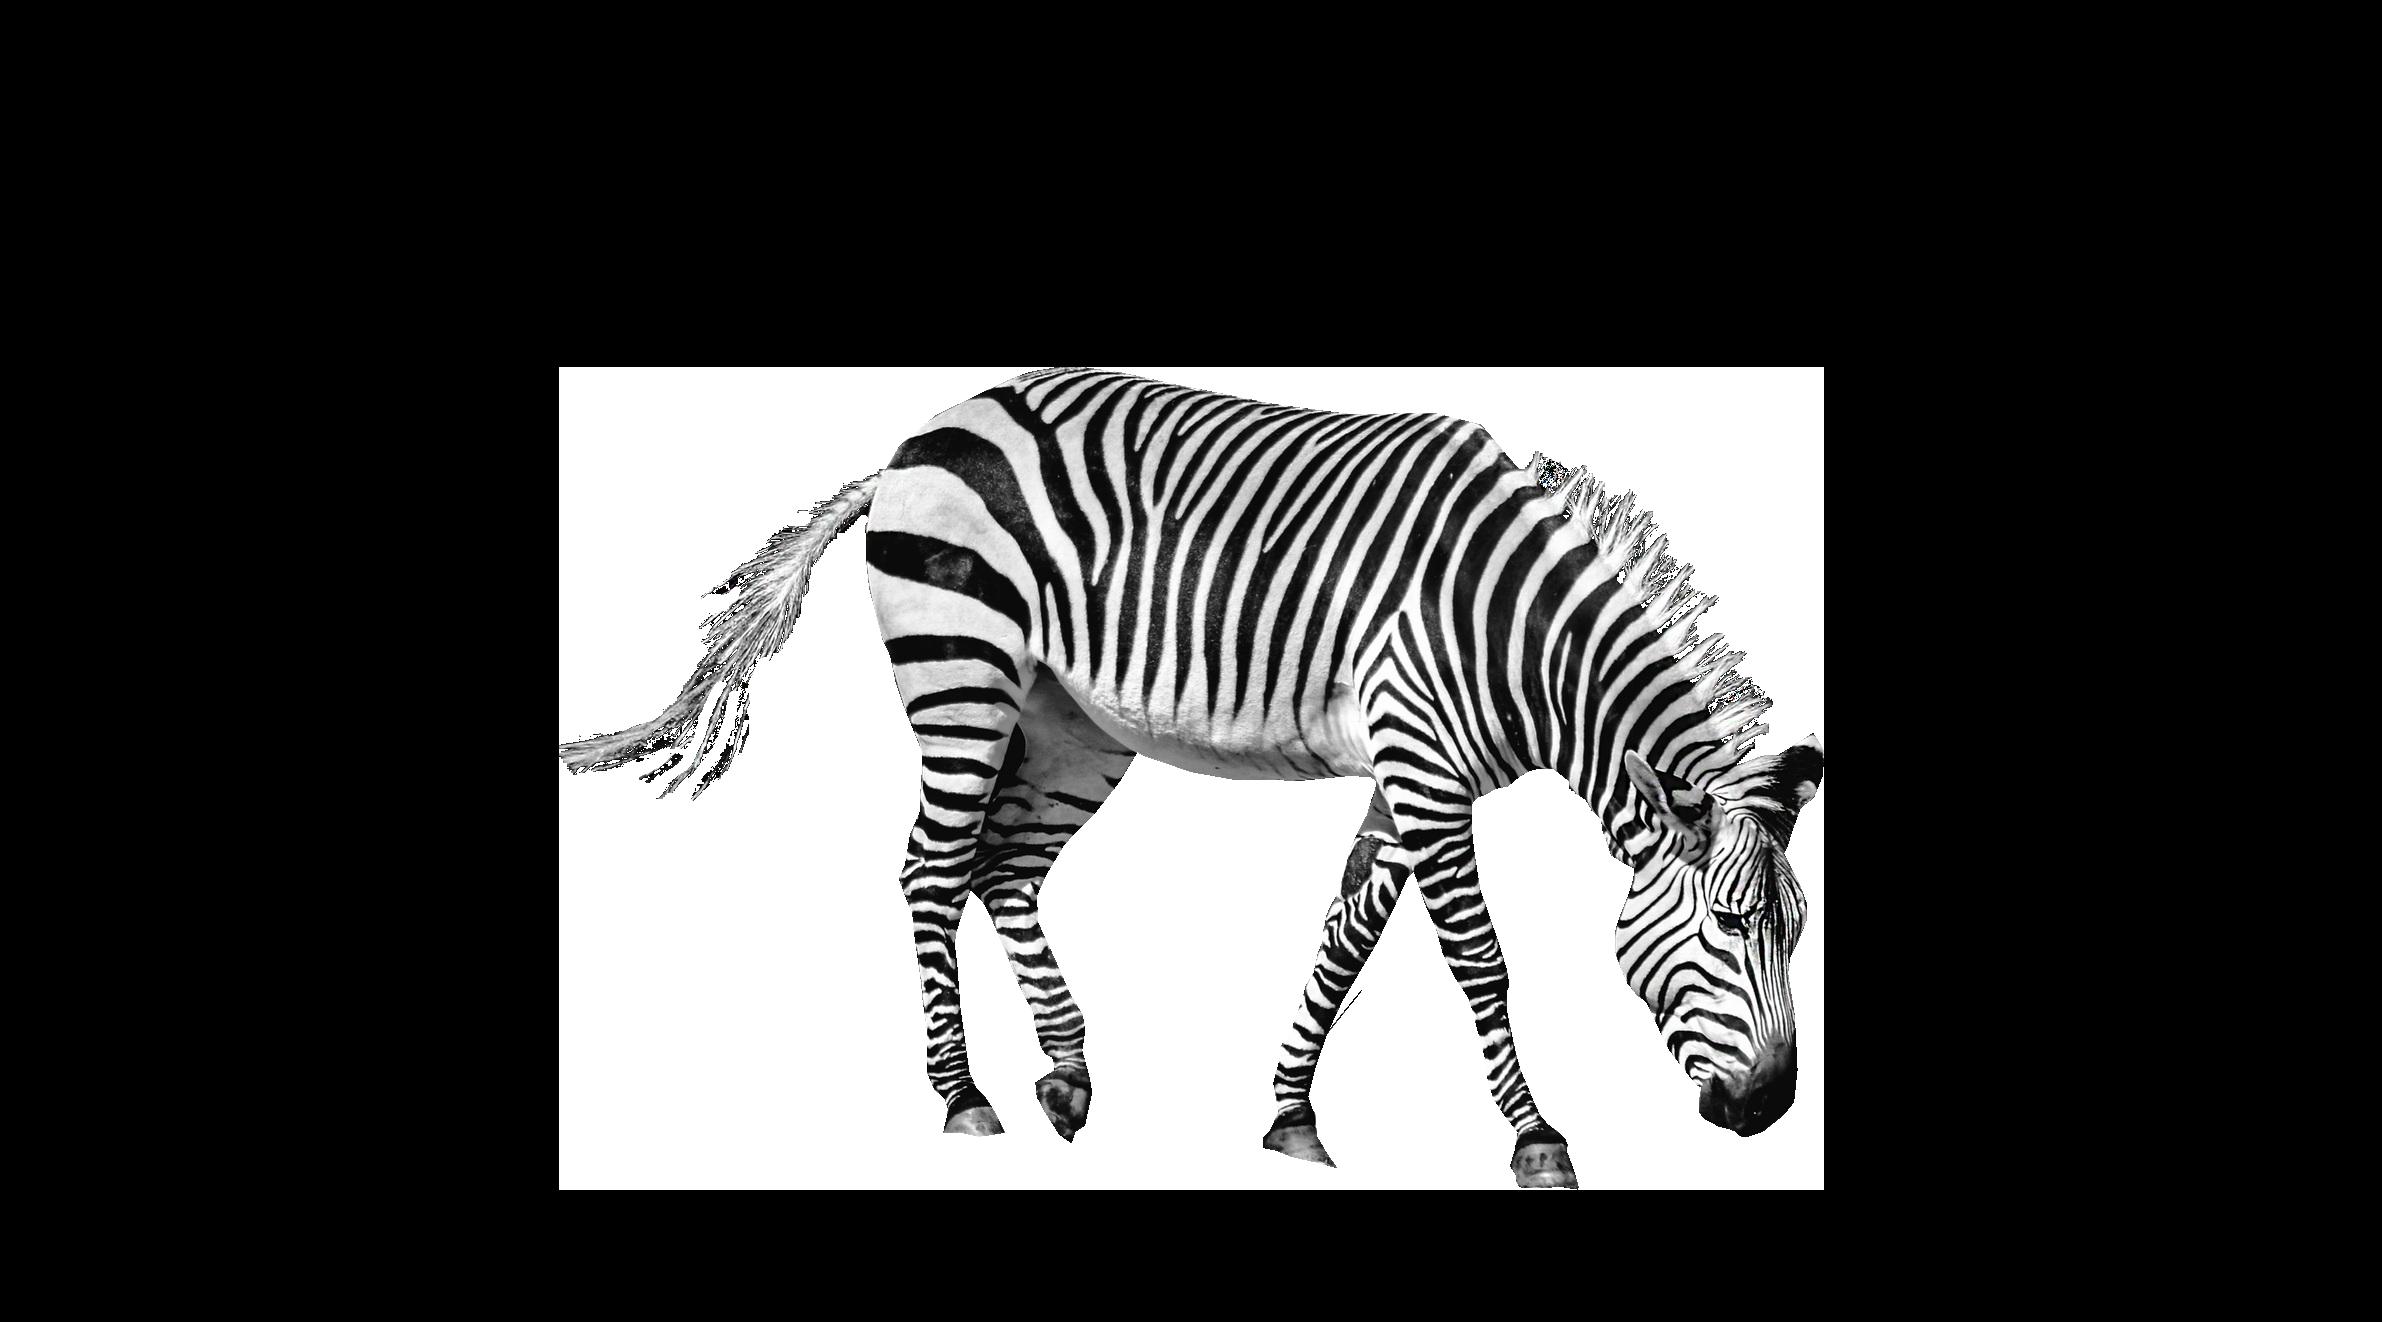 Zebra PNG Image Zebra, African animals, Png images